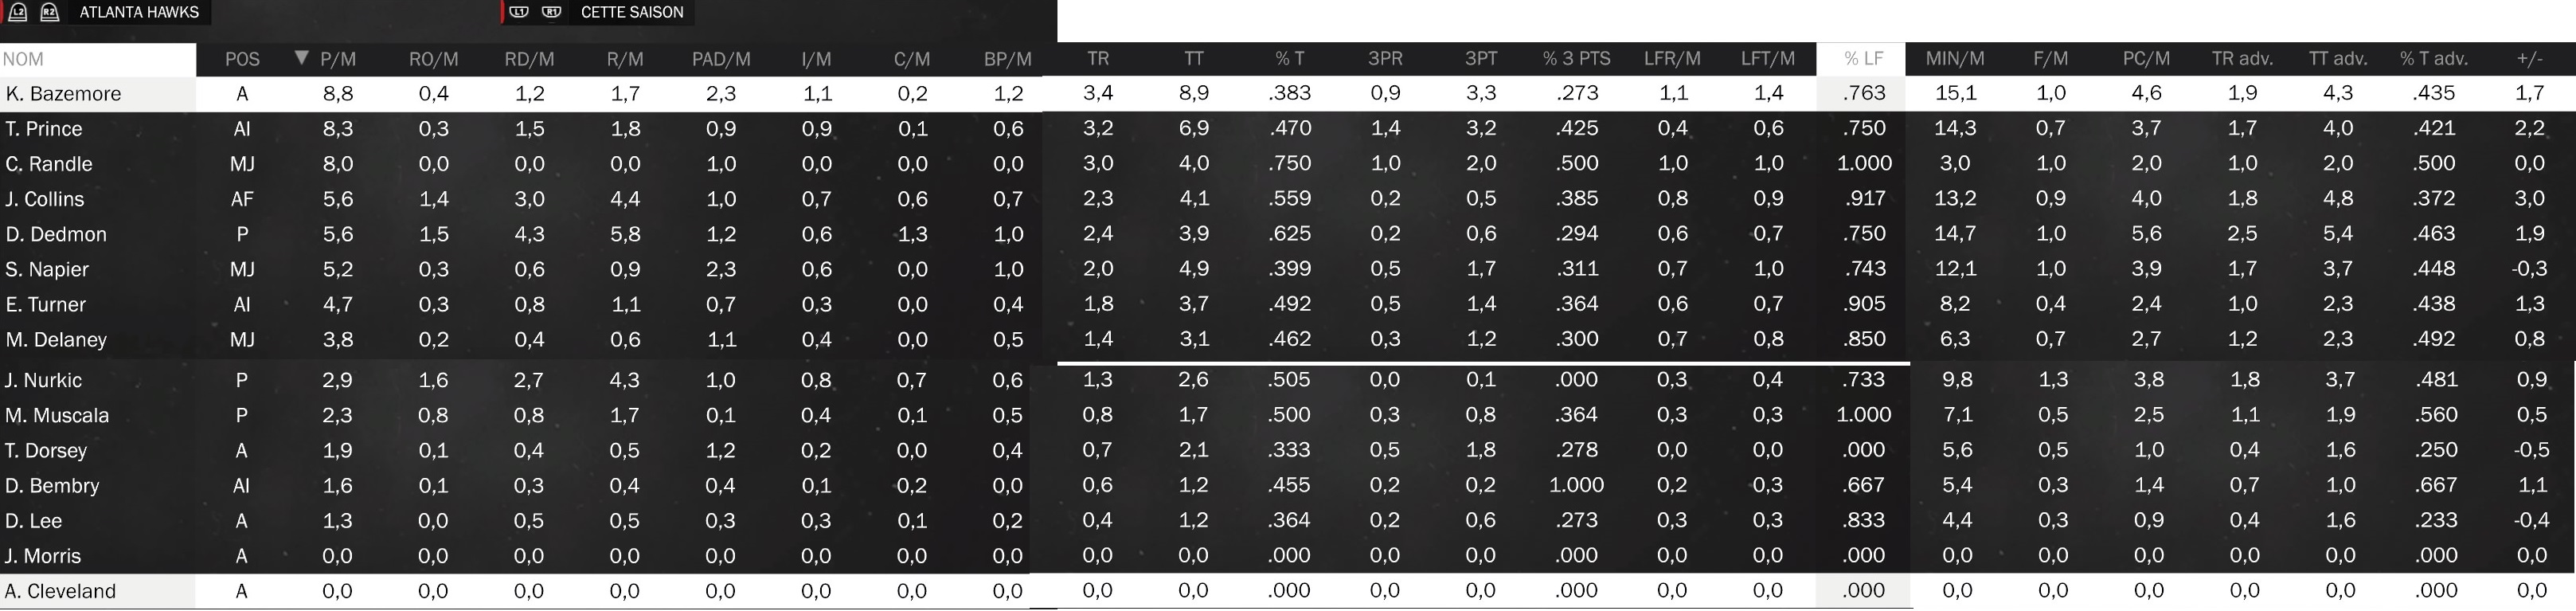 Statistiques individuelles Hawks10